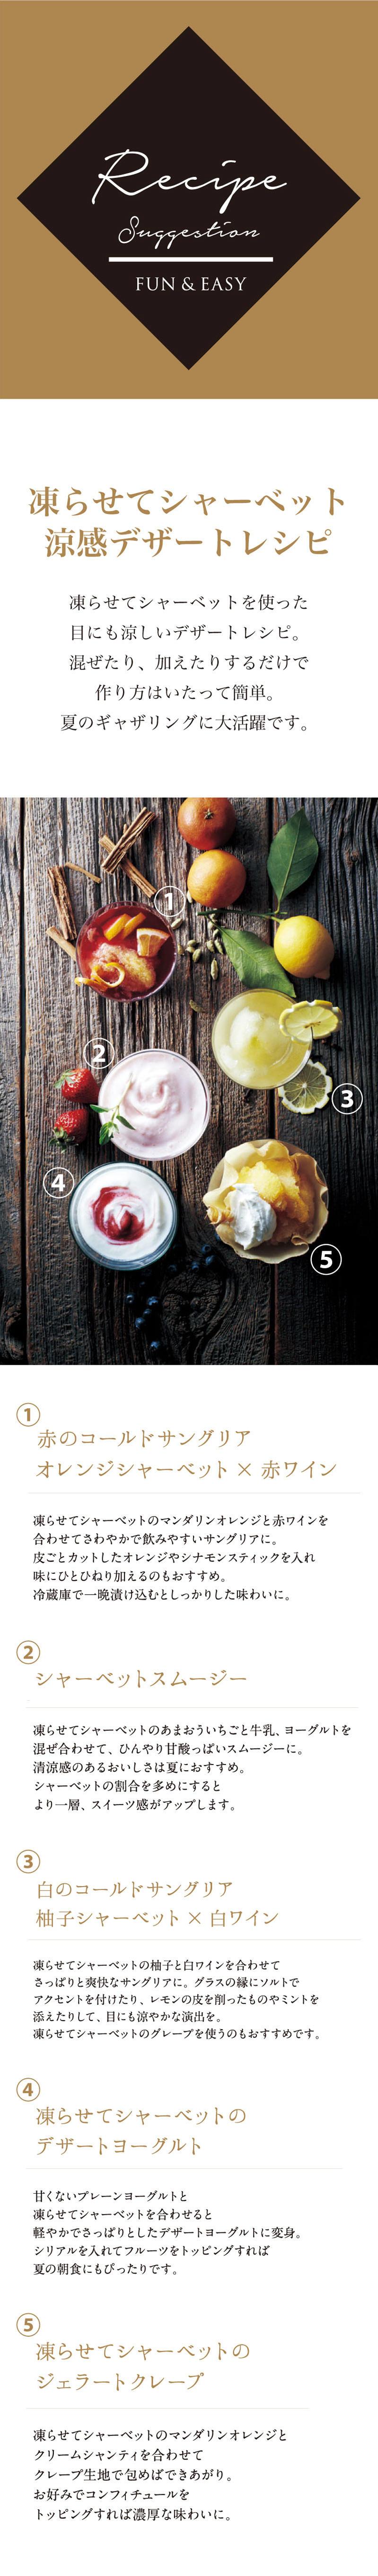 dessertrecipe.jpg